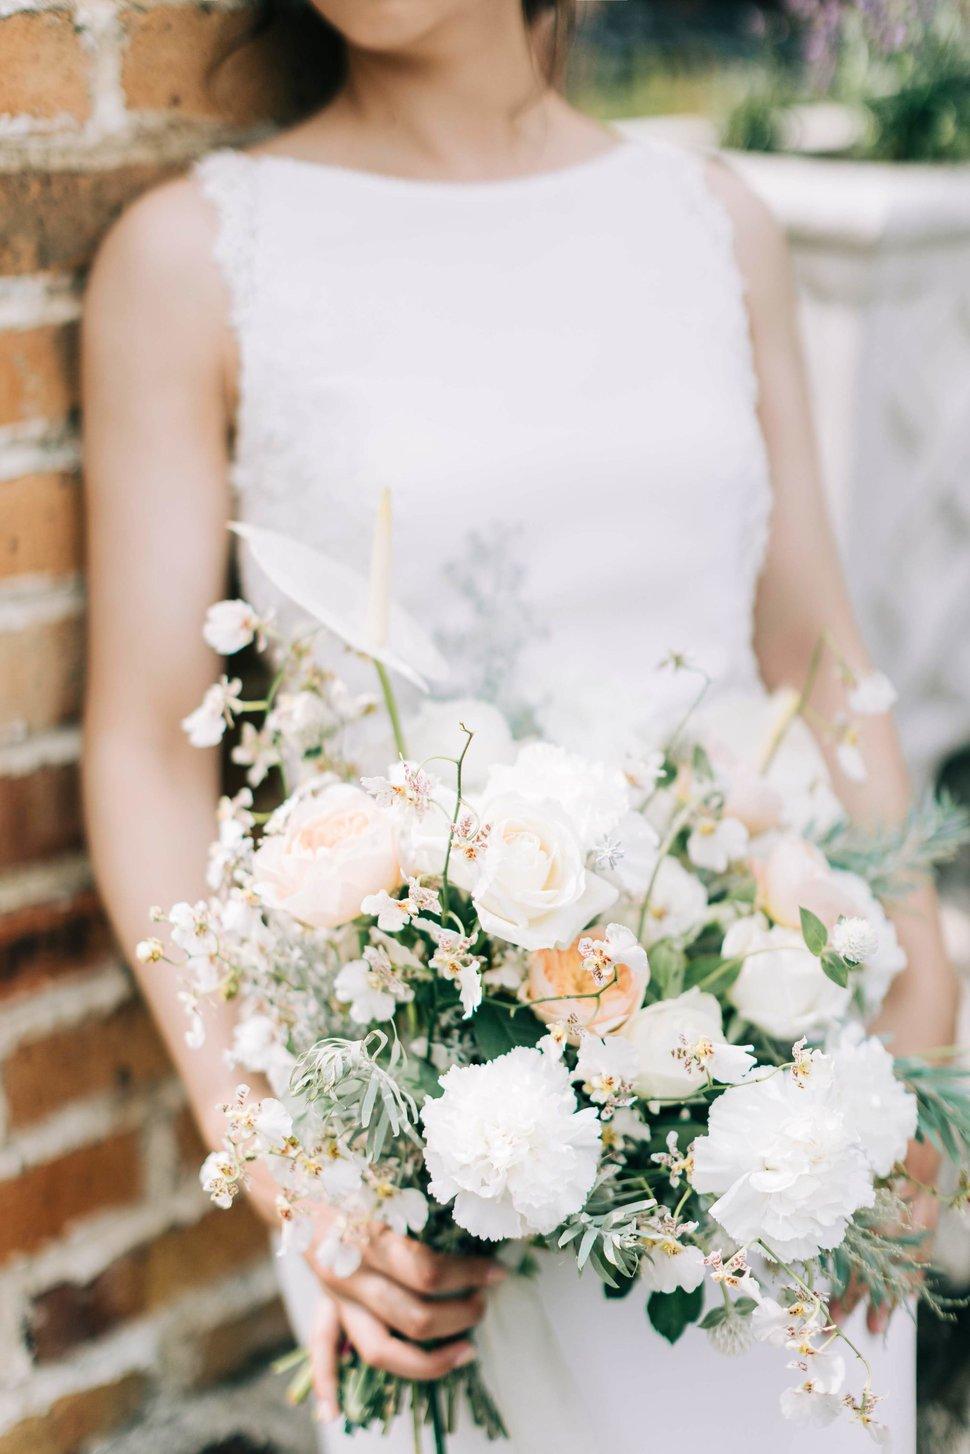 AG3_6581A - Cradle Wedding搖籃手工婚紗《結婚吧》